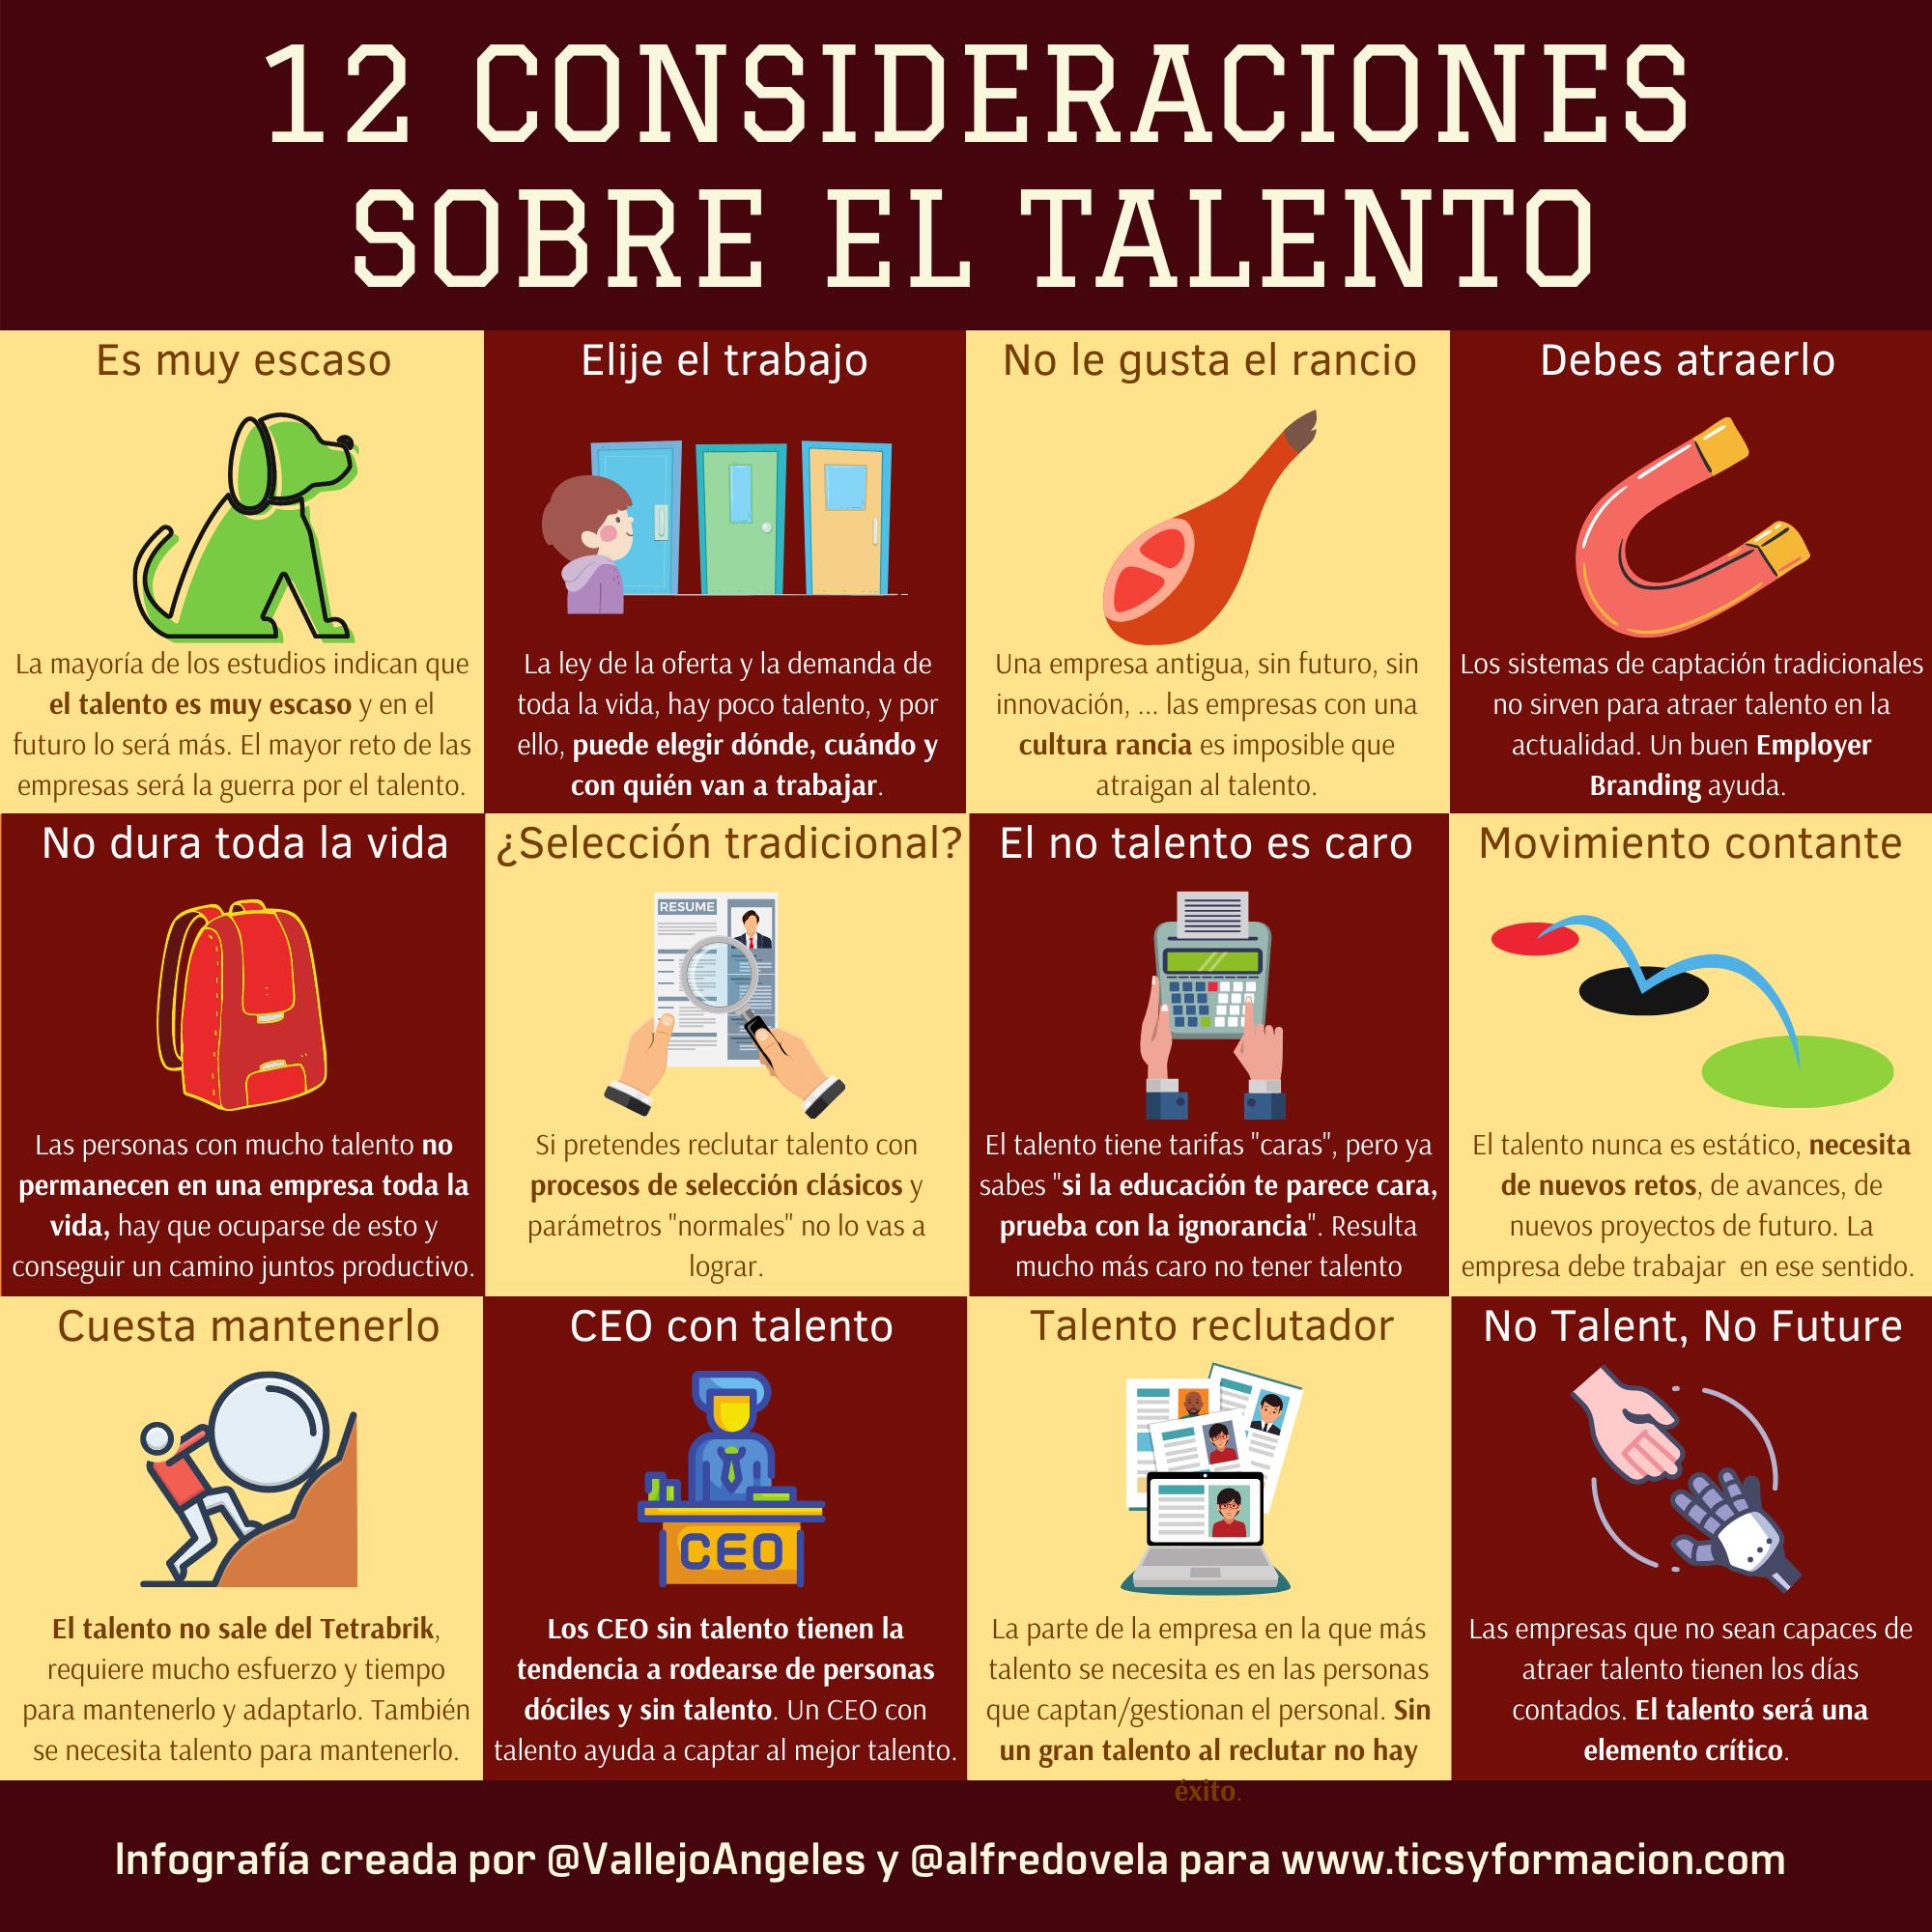 12 consideraciones sobre el talento #infografia #rrhh #talento